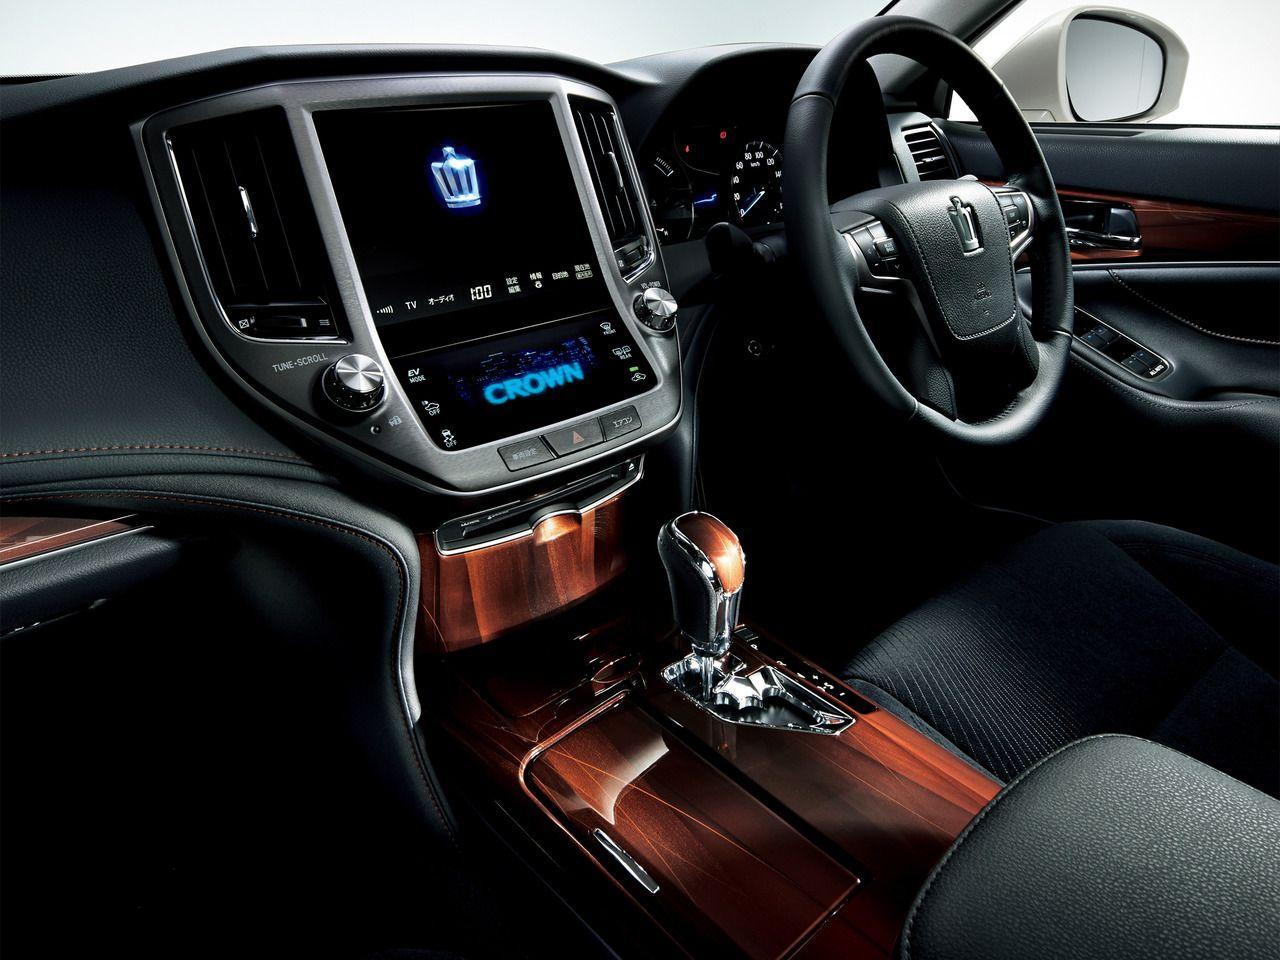 2014 Toyota Crown Hybrid Royal Saloon Автомобили, Тачка